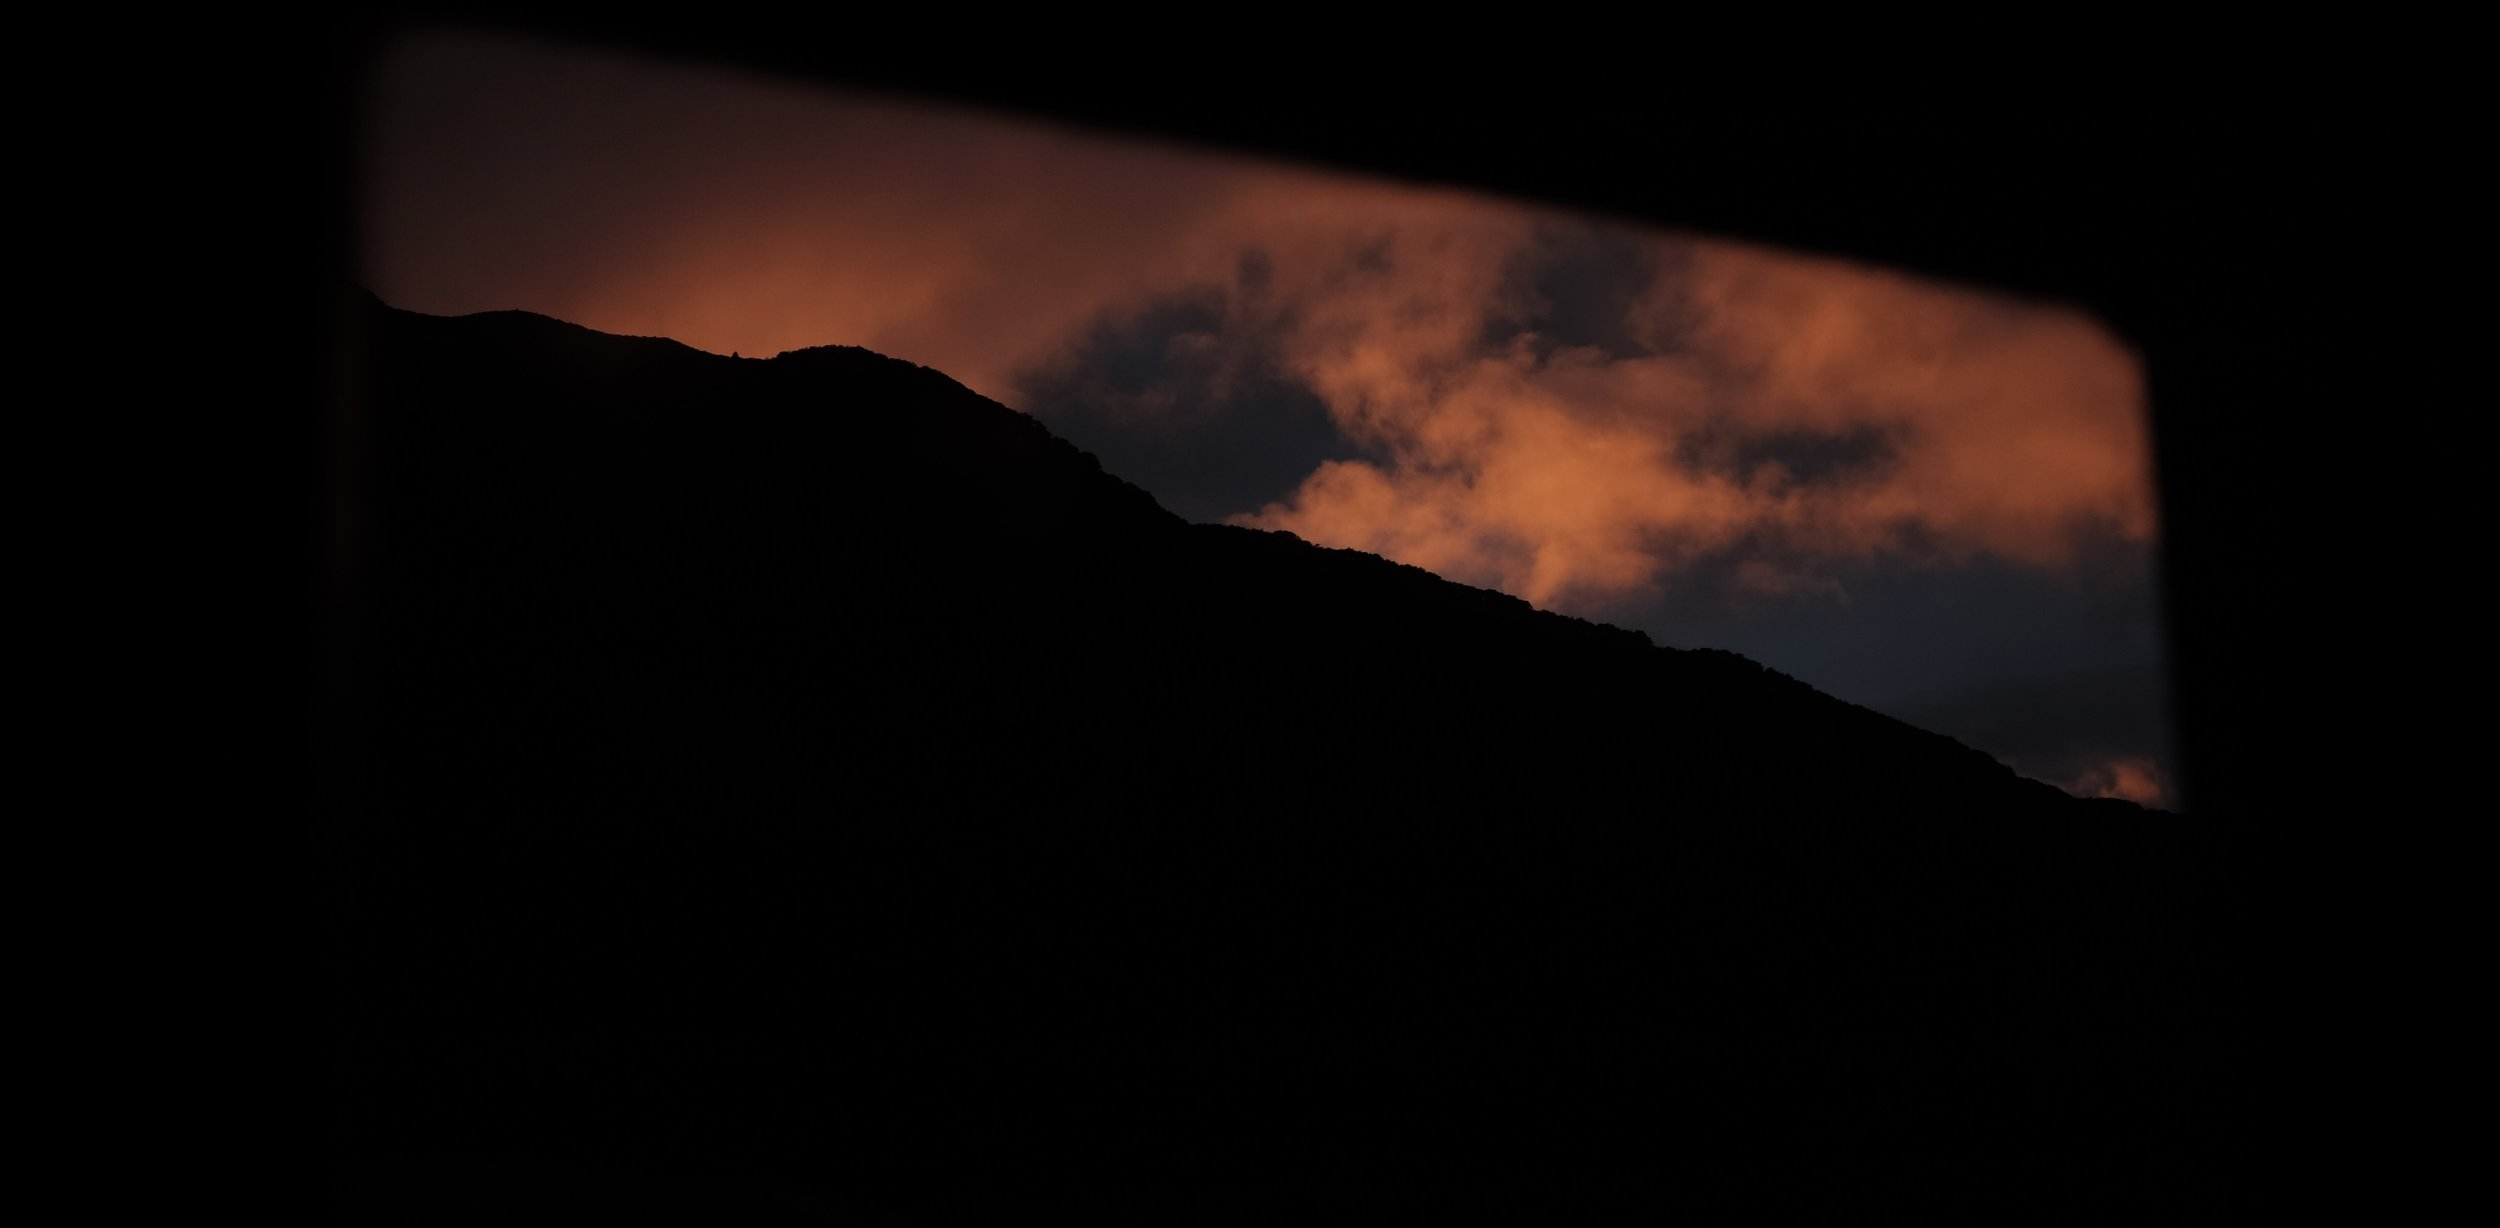 The sun rises outside Aparima Hut in the Takitimu Forest.